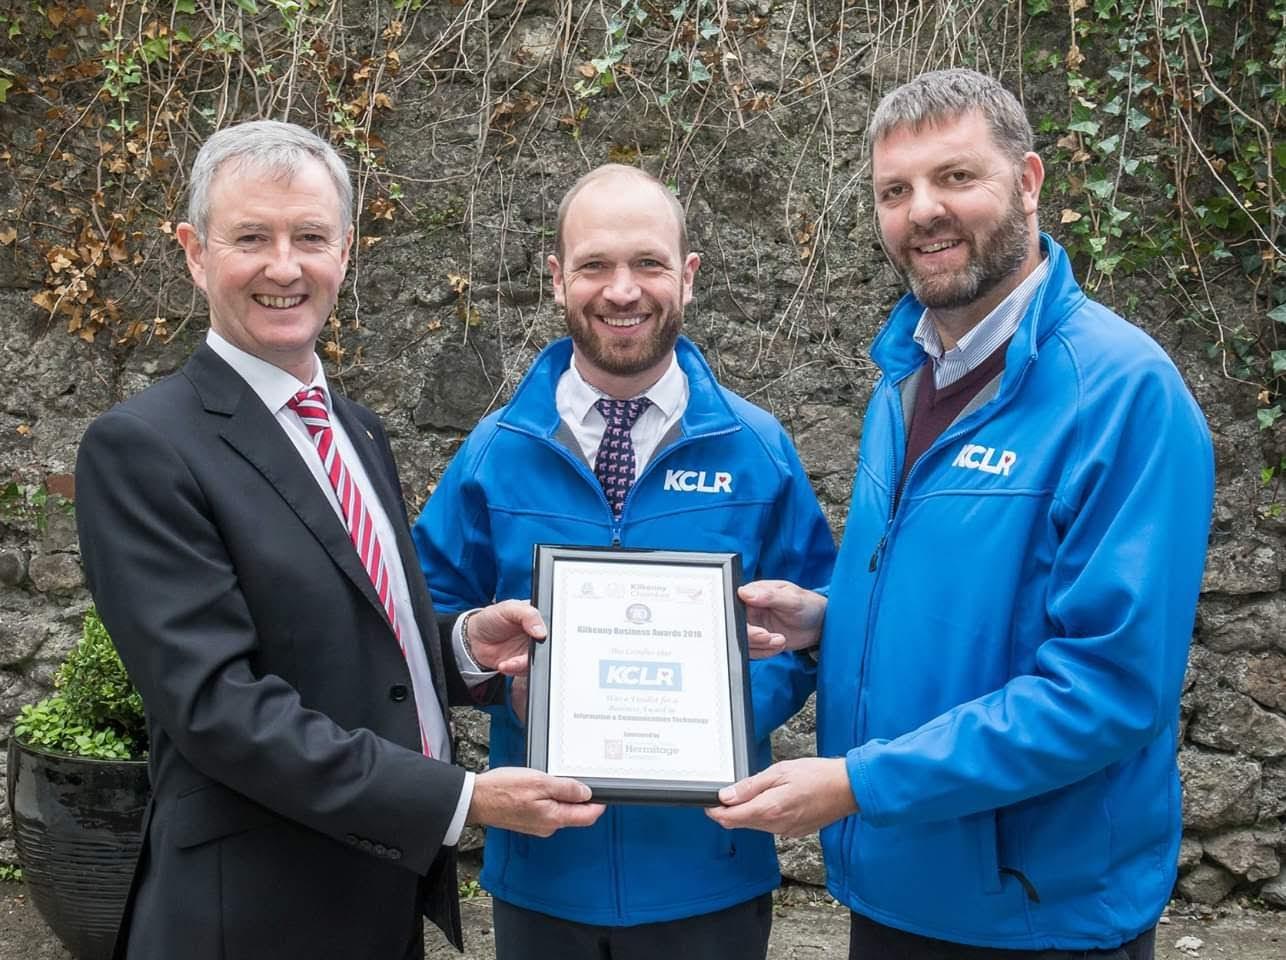 Kilkenny Chamber's John Hurley with KCLR's Pat Gardiner and John Purcell, CEO